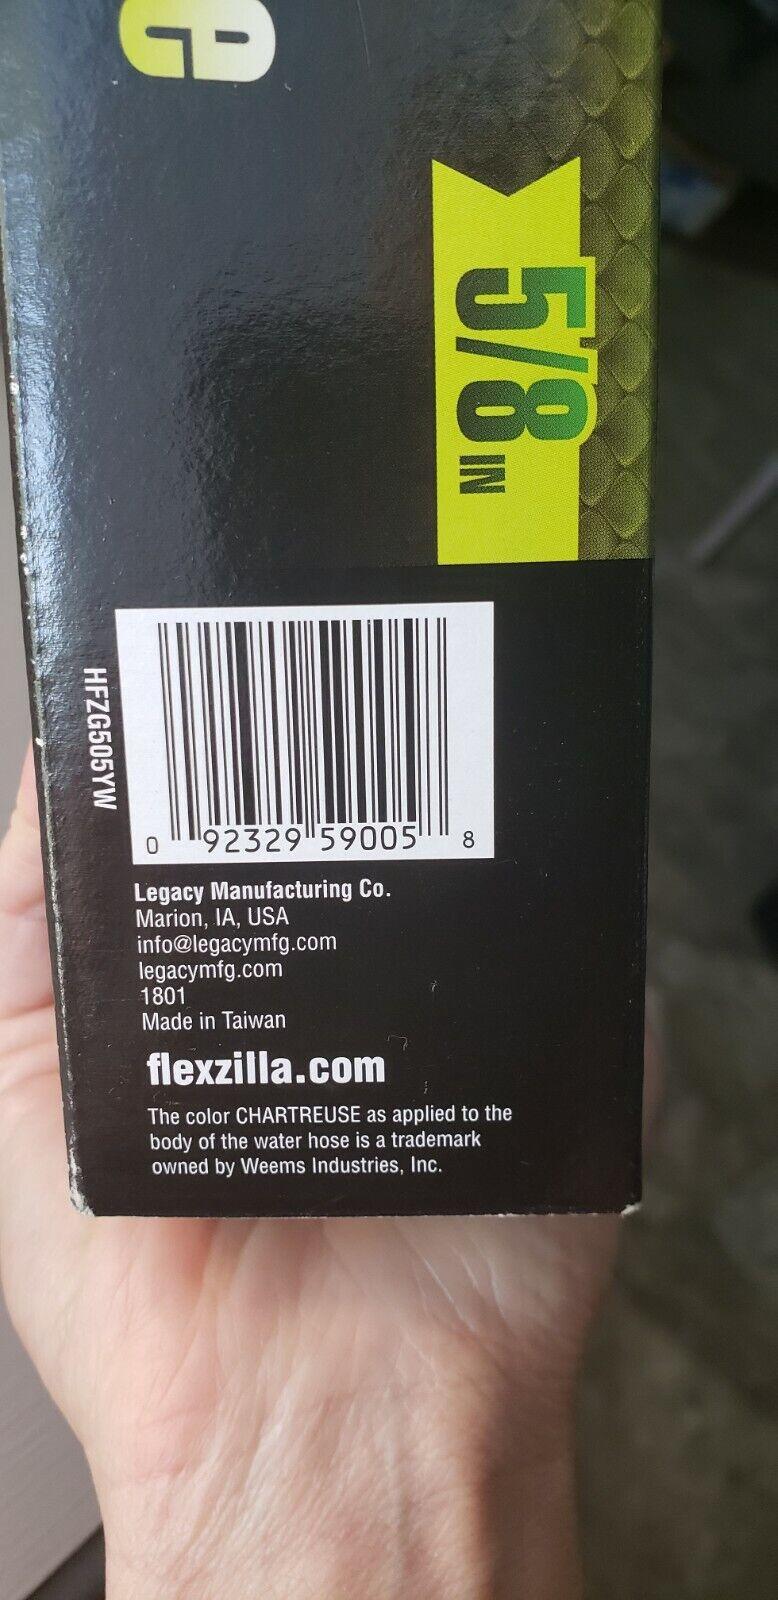 Flexzilla Flexible Hybrid Polymer 5ft 5/8in Lead In Hose- Fast Shipping